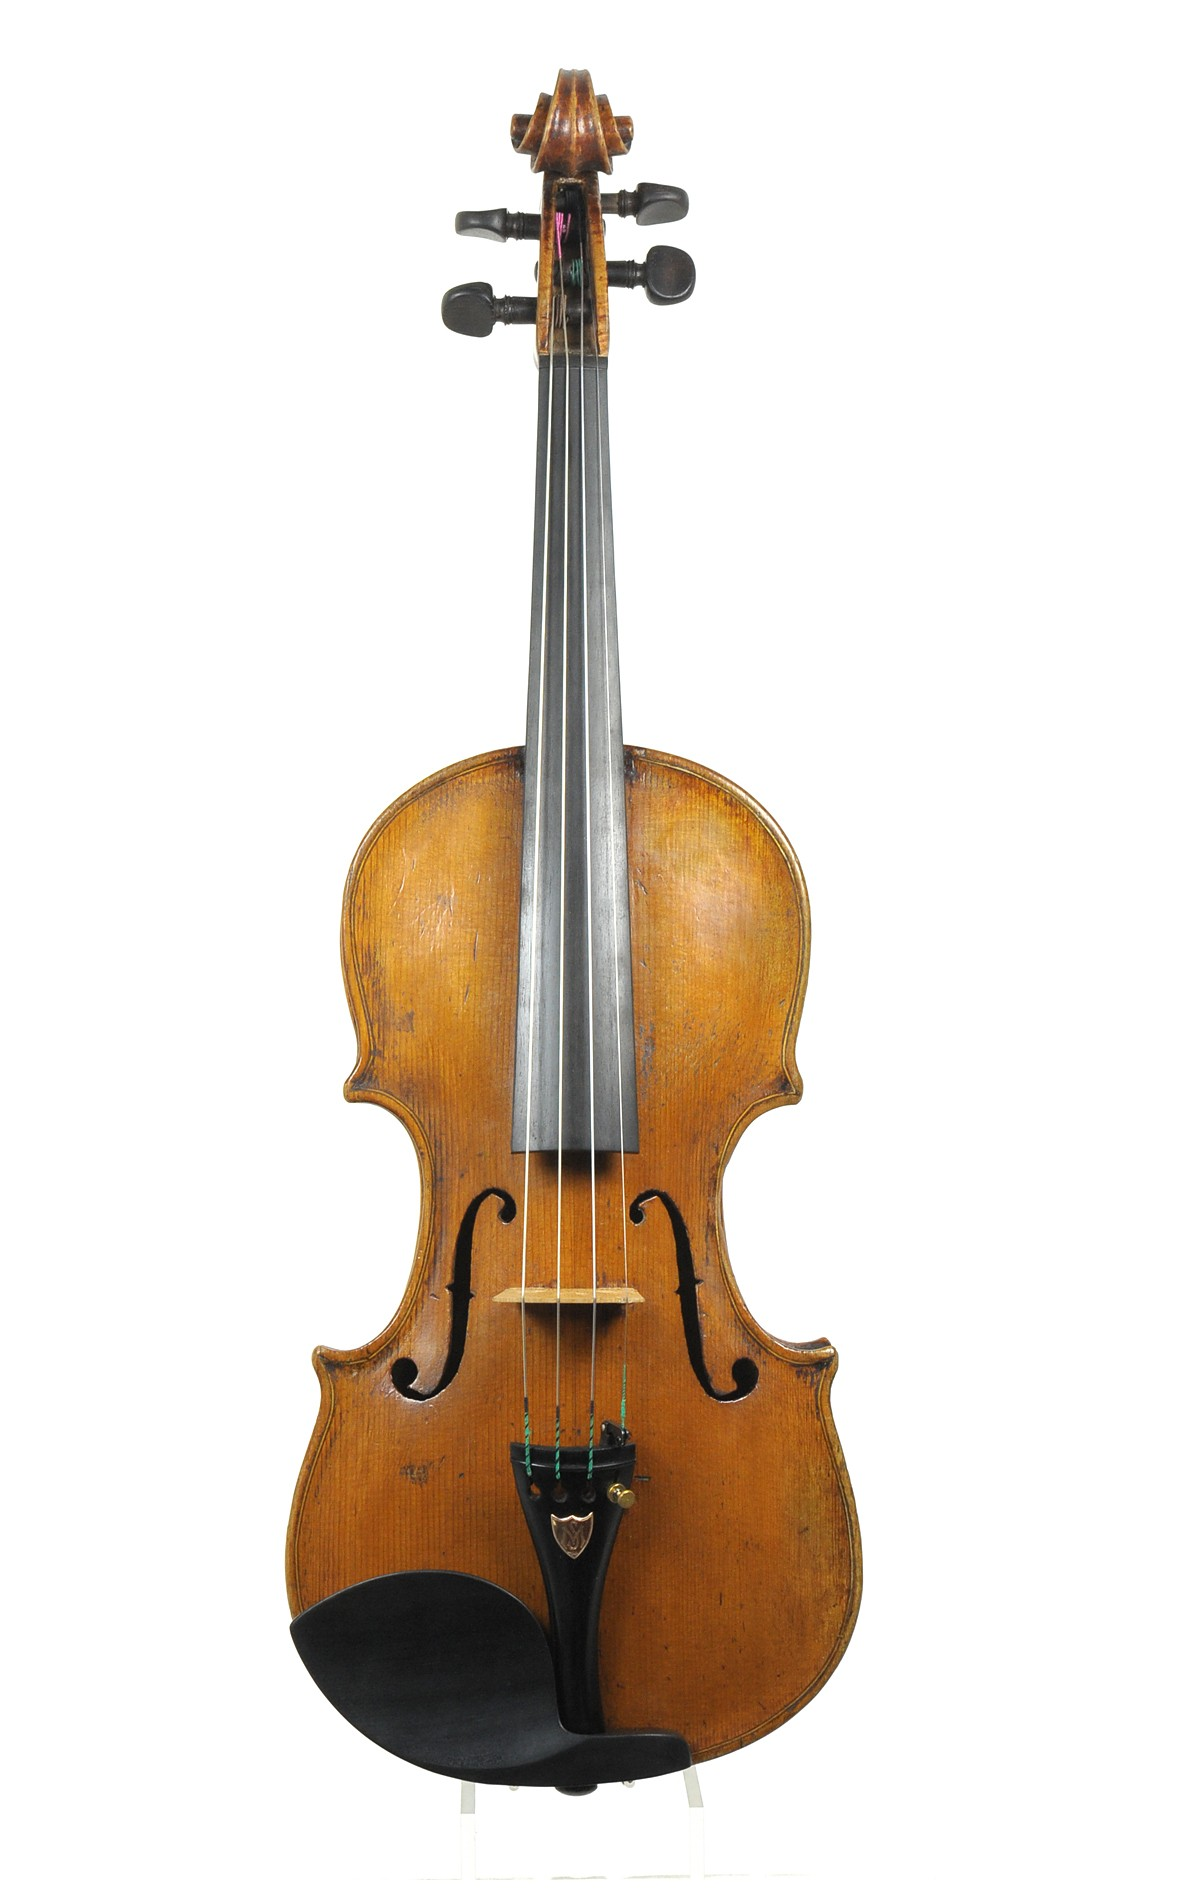 Italian violin by Luigi Cardi, Verona